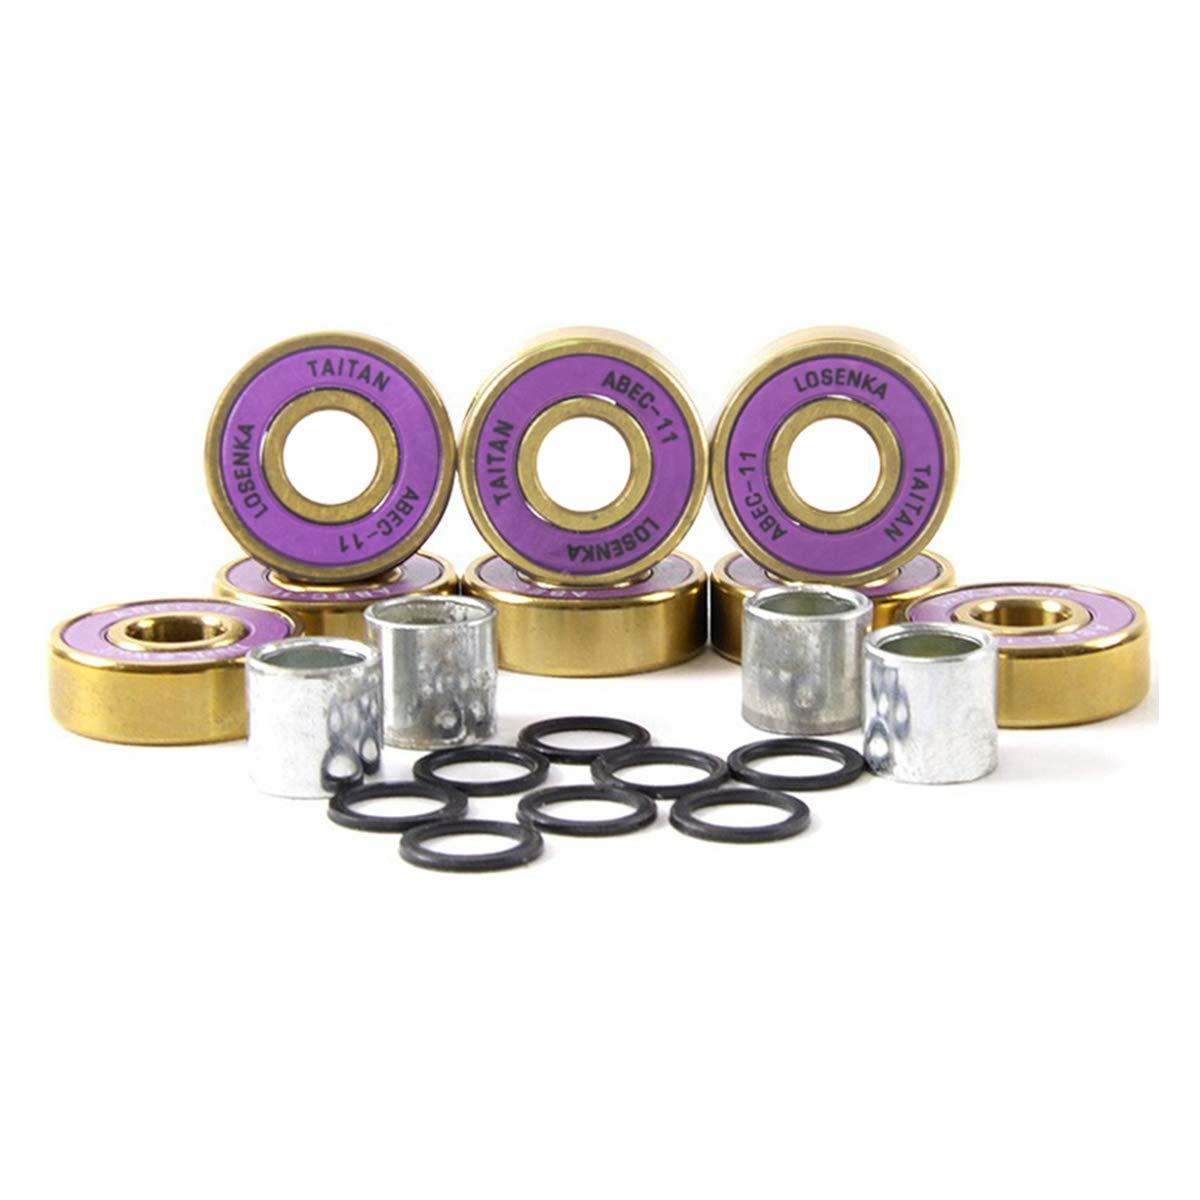 8-Pack LOSENKA Professional Skateboard Bearings Titanium Alloy Process Limit Skateboards,8-Pack Fancy Skateboard Bearings